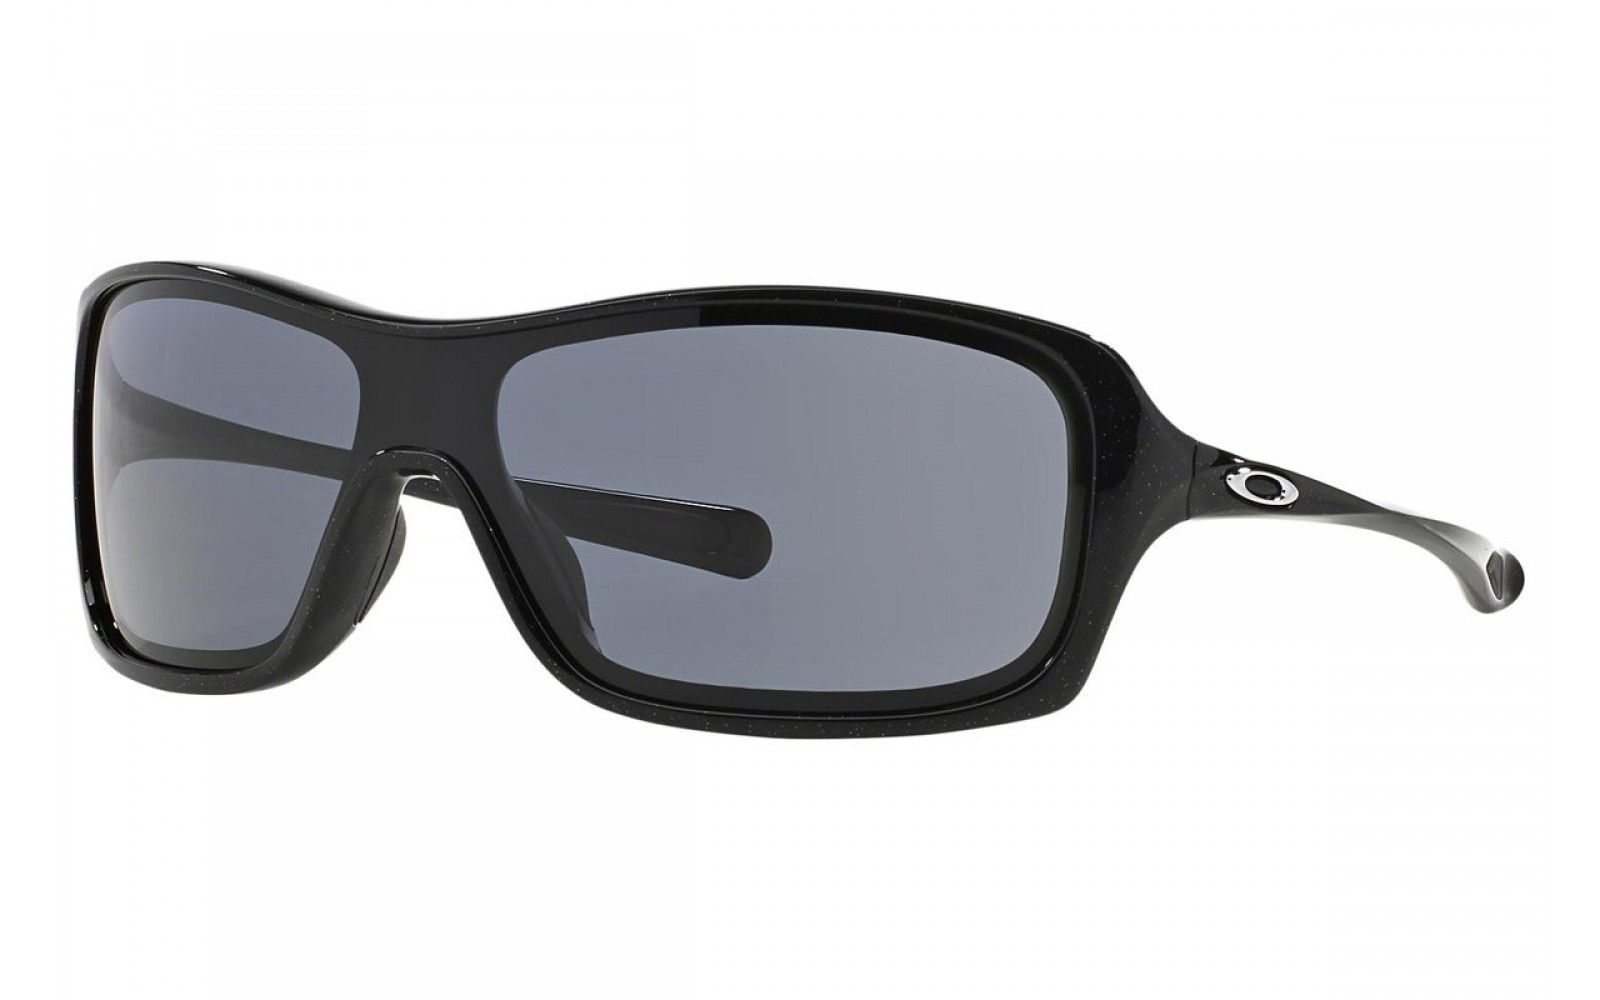 Oakley Break Up - Metallic Black / Grey - OO9202-01 Zonnebril